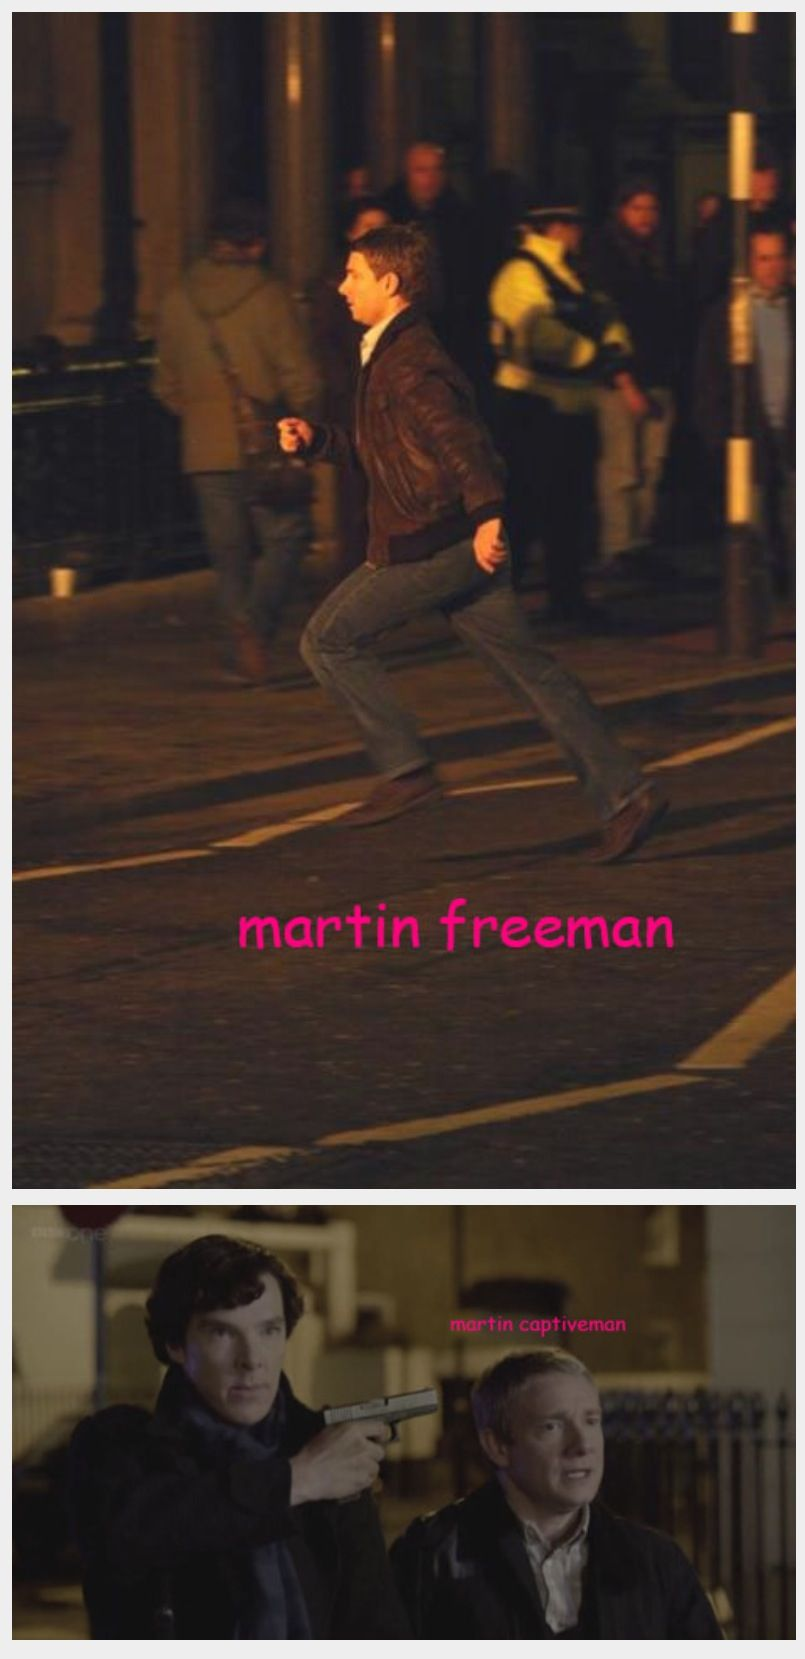 Martin freeman, Martin Captiveman - I see what you did there ;)